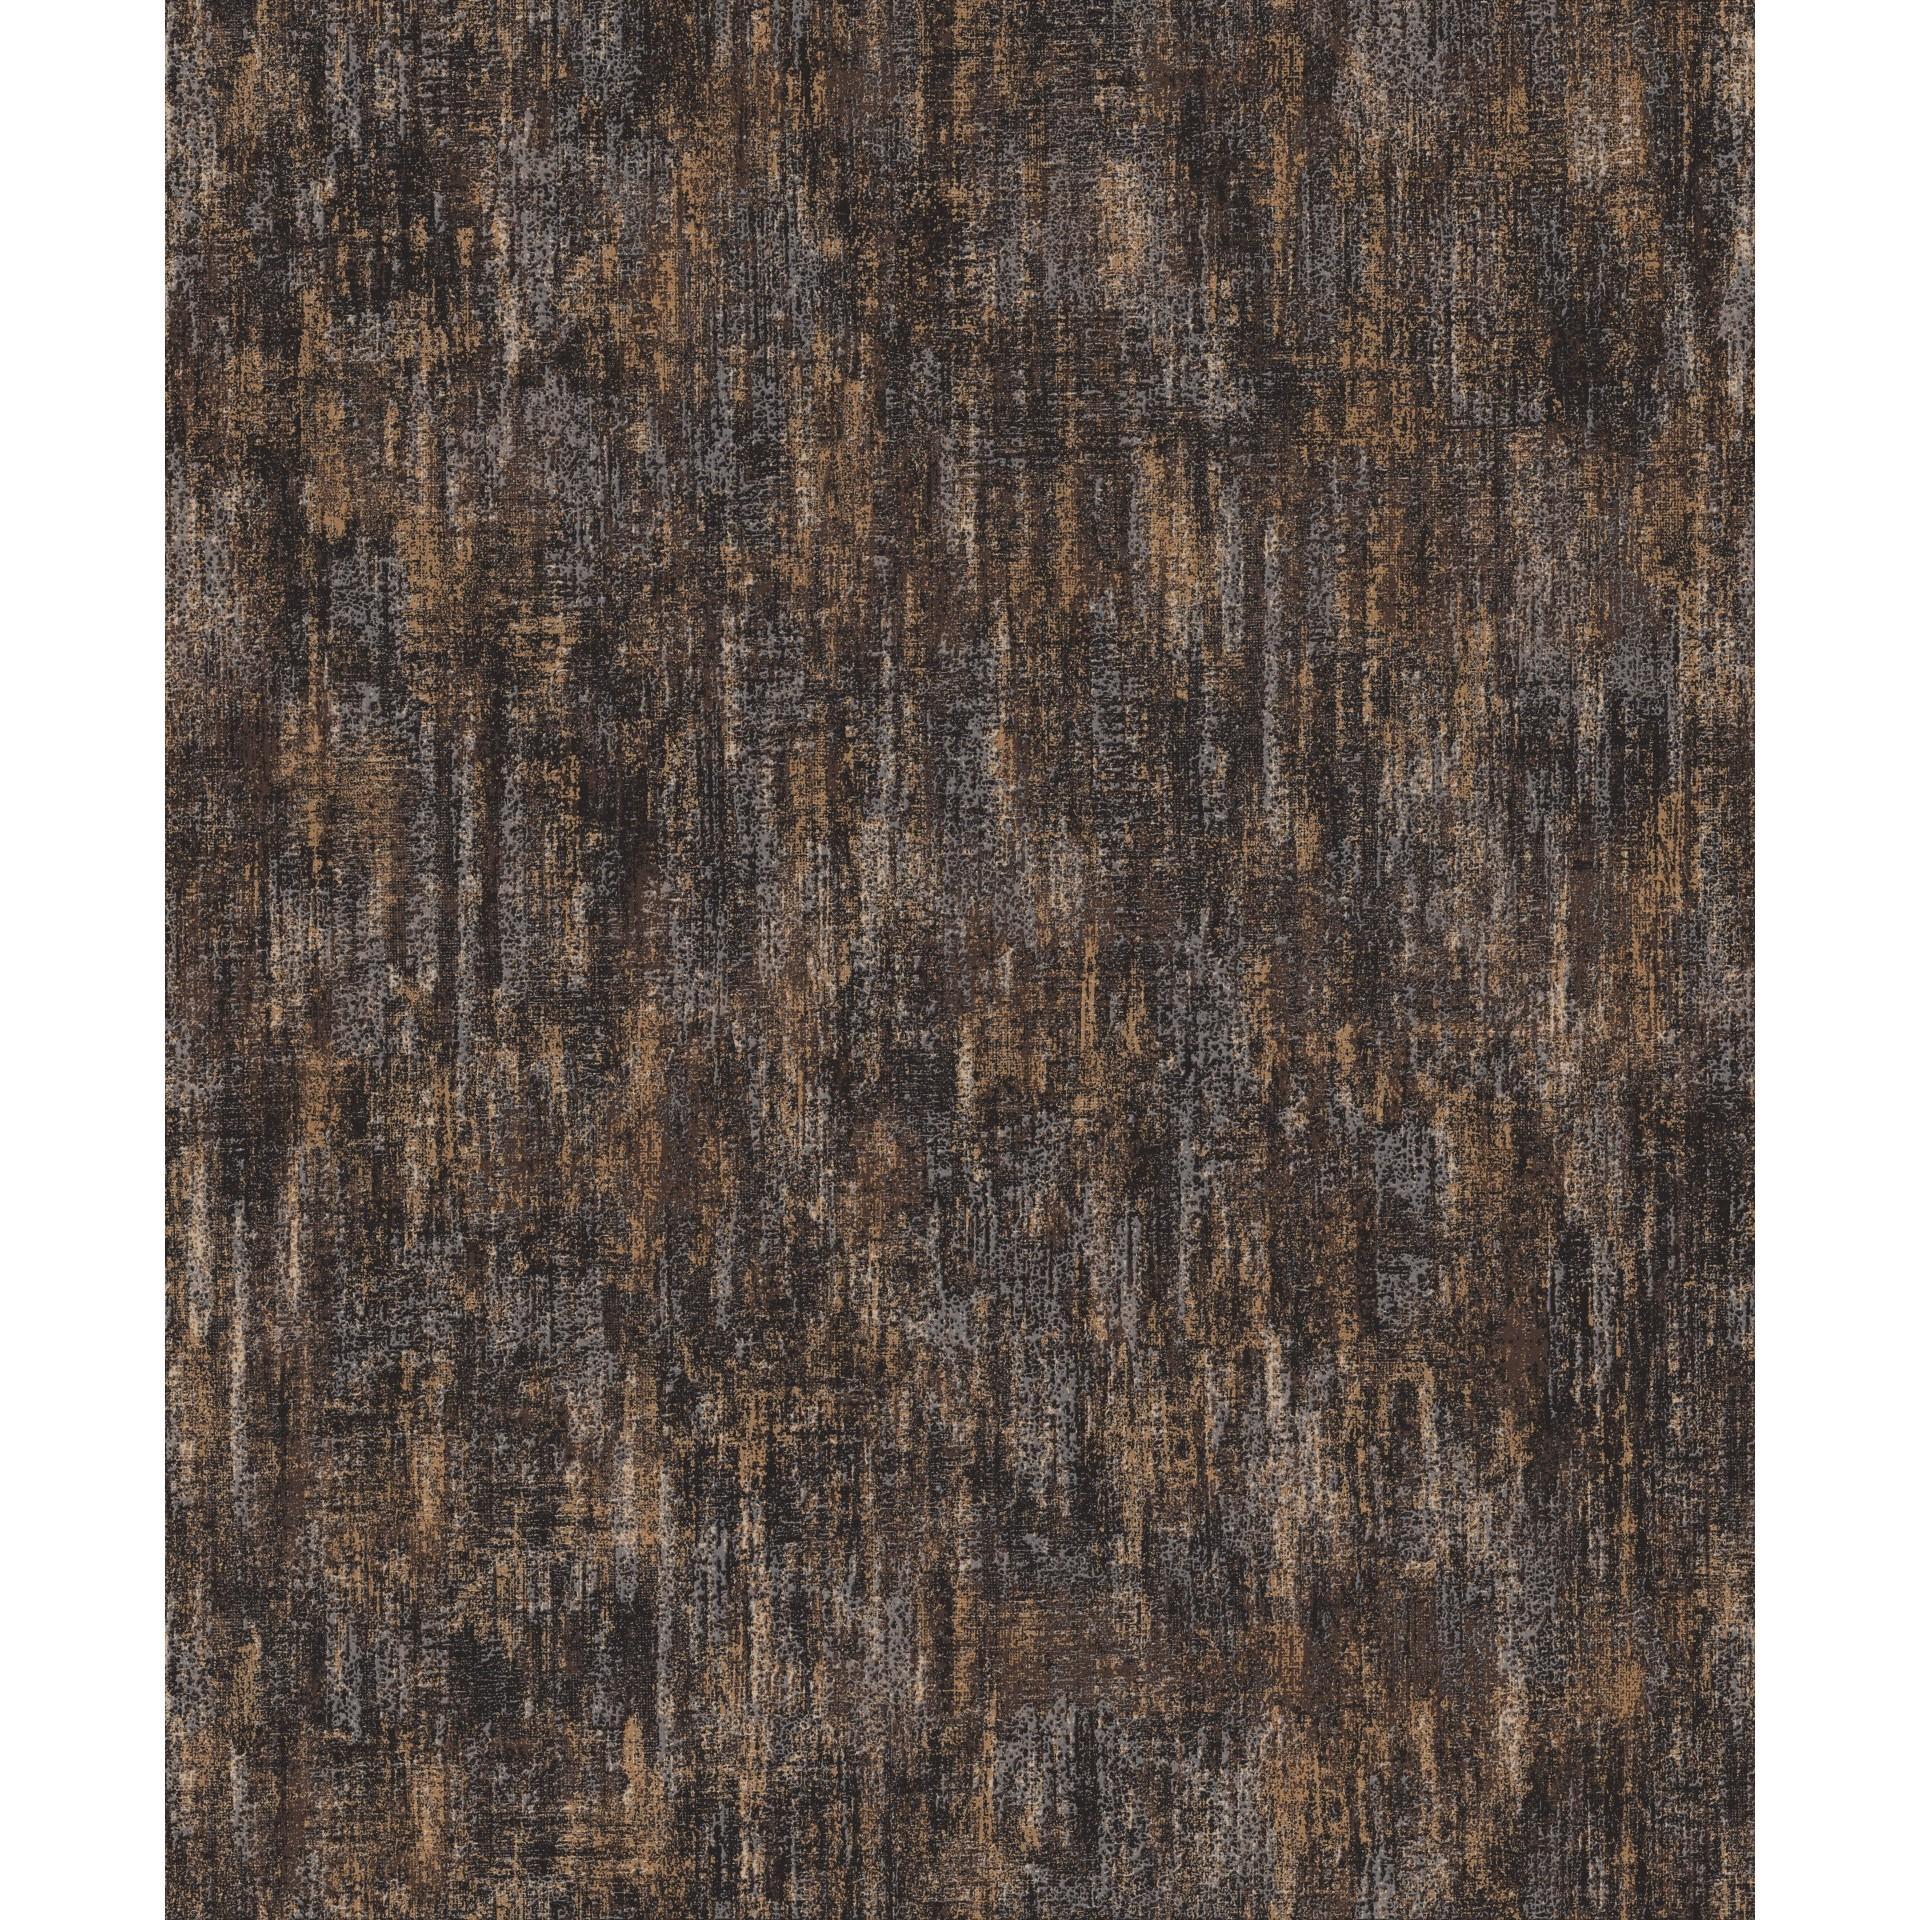 Papel de Parede 53cm x 10m Nonwoven Texturizado 1006 - Jolie